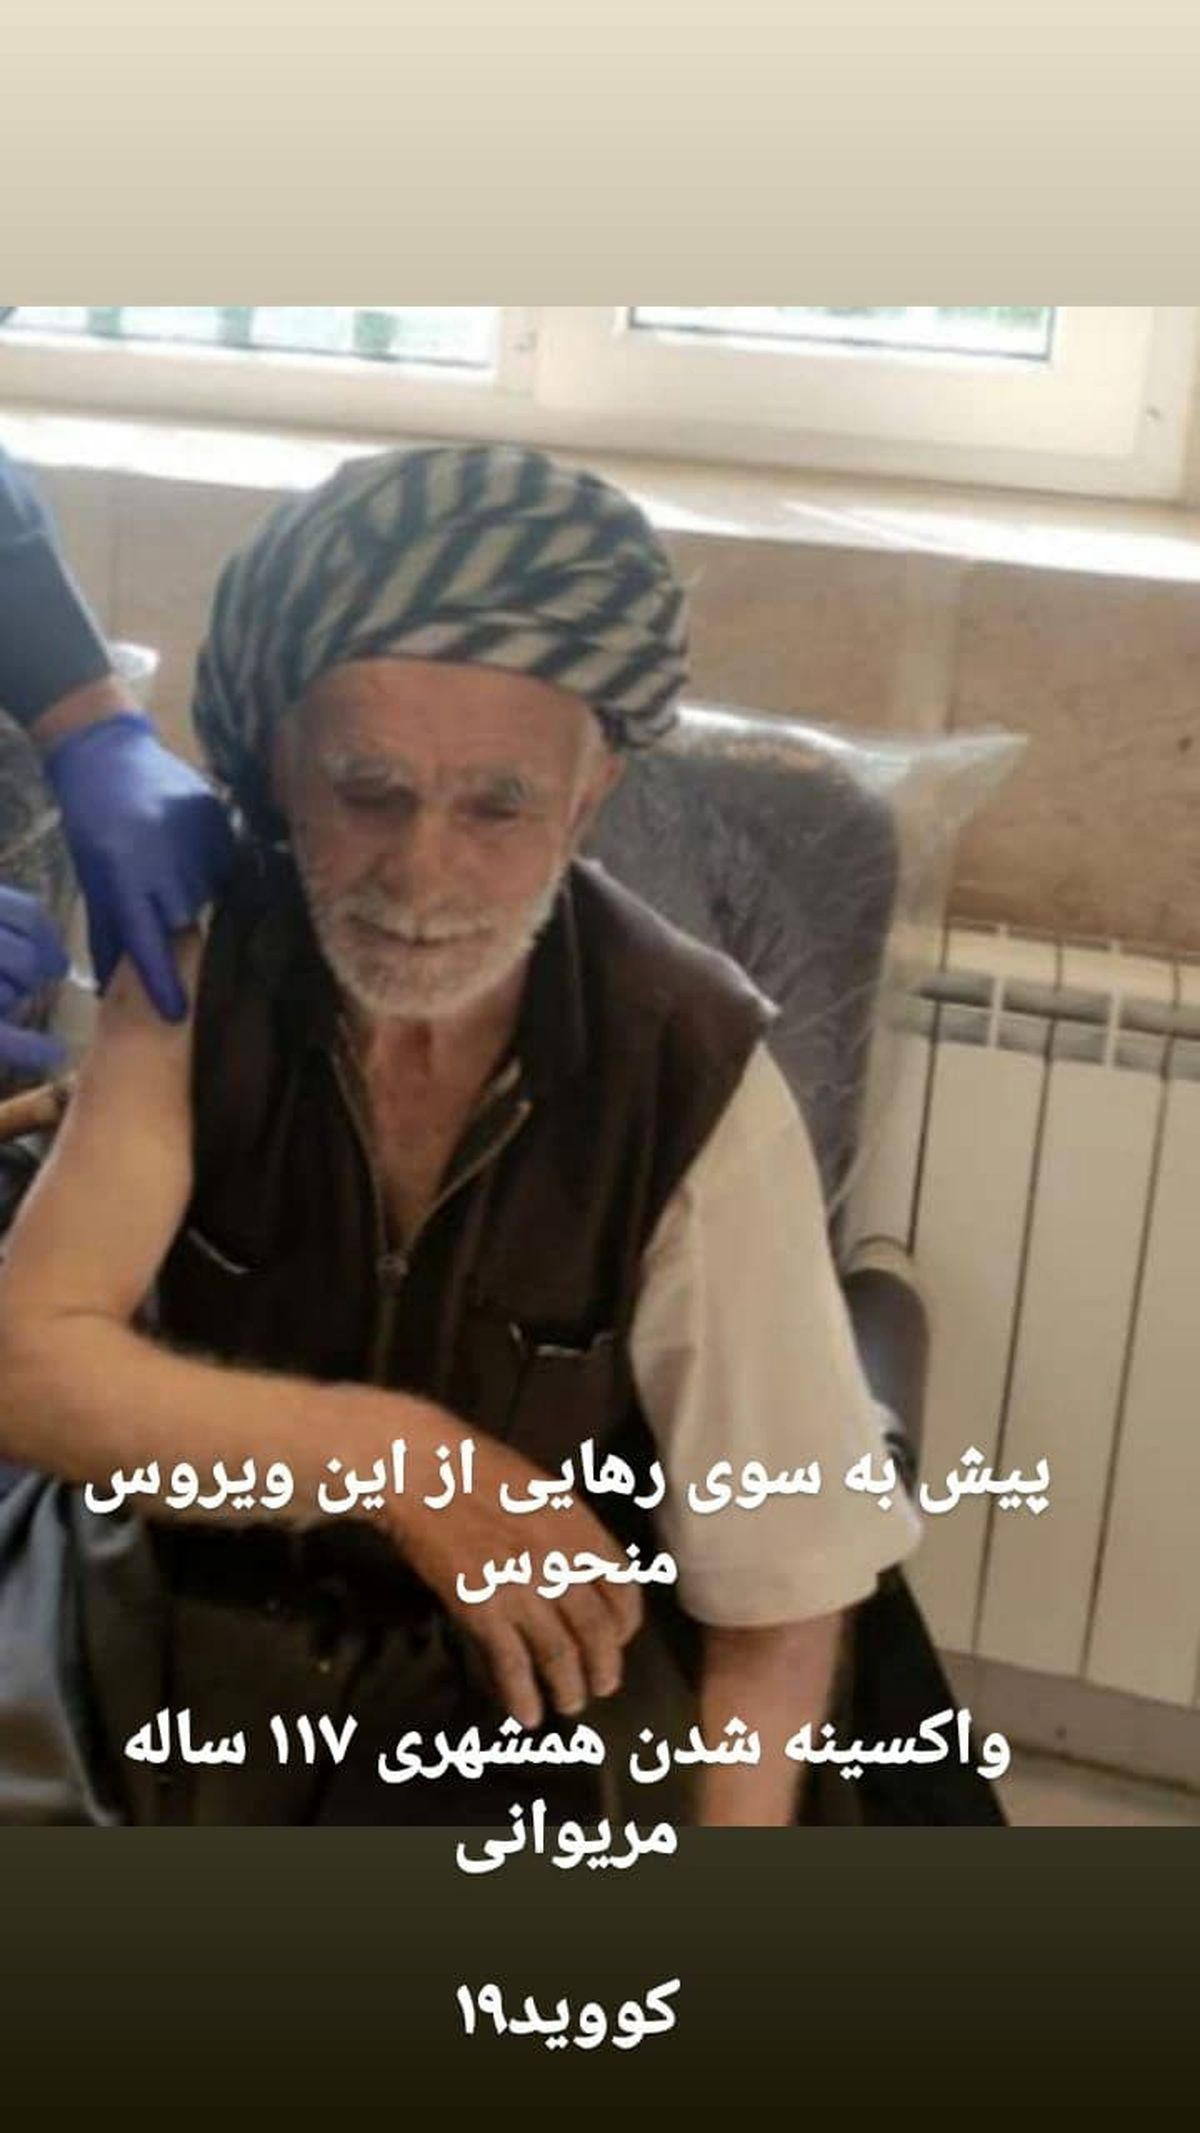 تزریق واکسن کرونا به سالمند ۱۱۷ ساله مریوانی +عکس